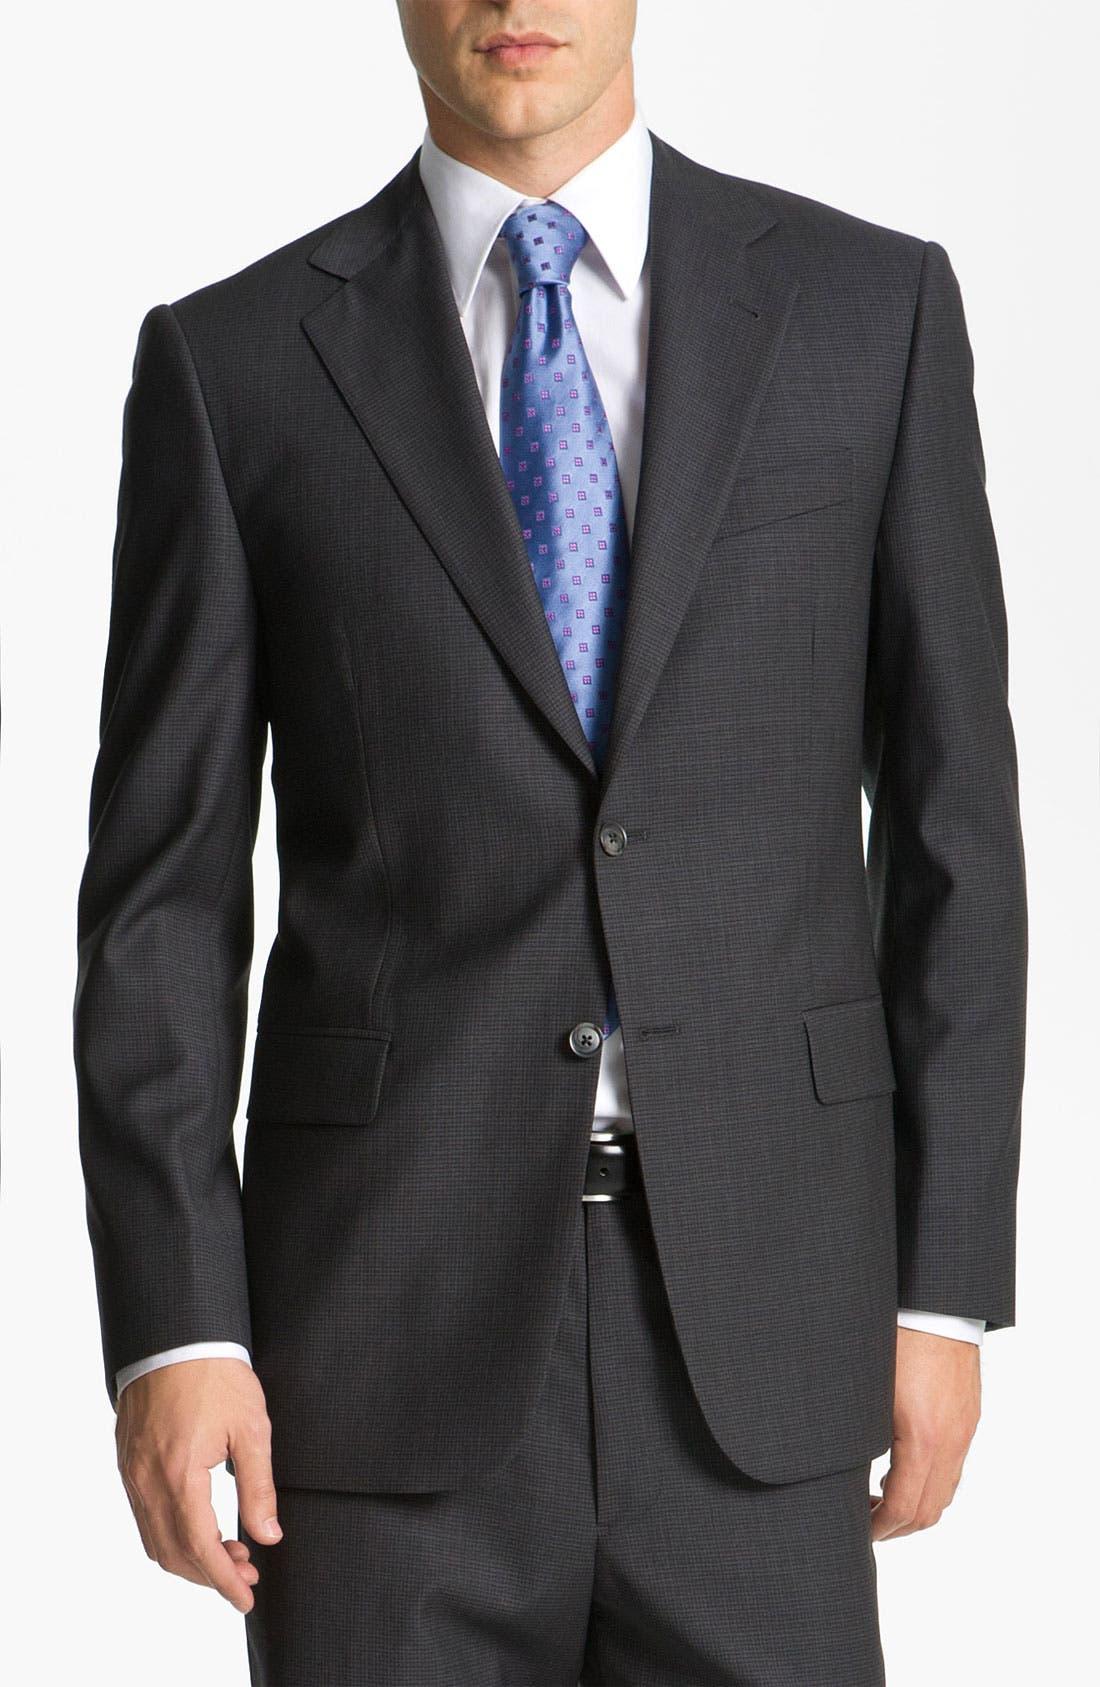 Alternate Image 1 Selected - Joseph Abboud 'Signature Silver' Check Suit